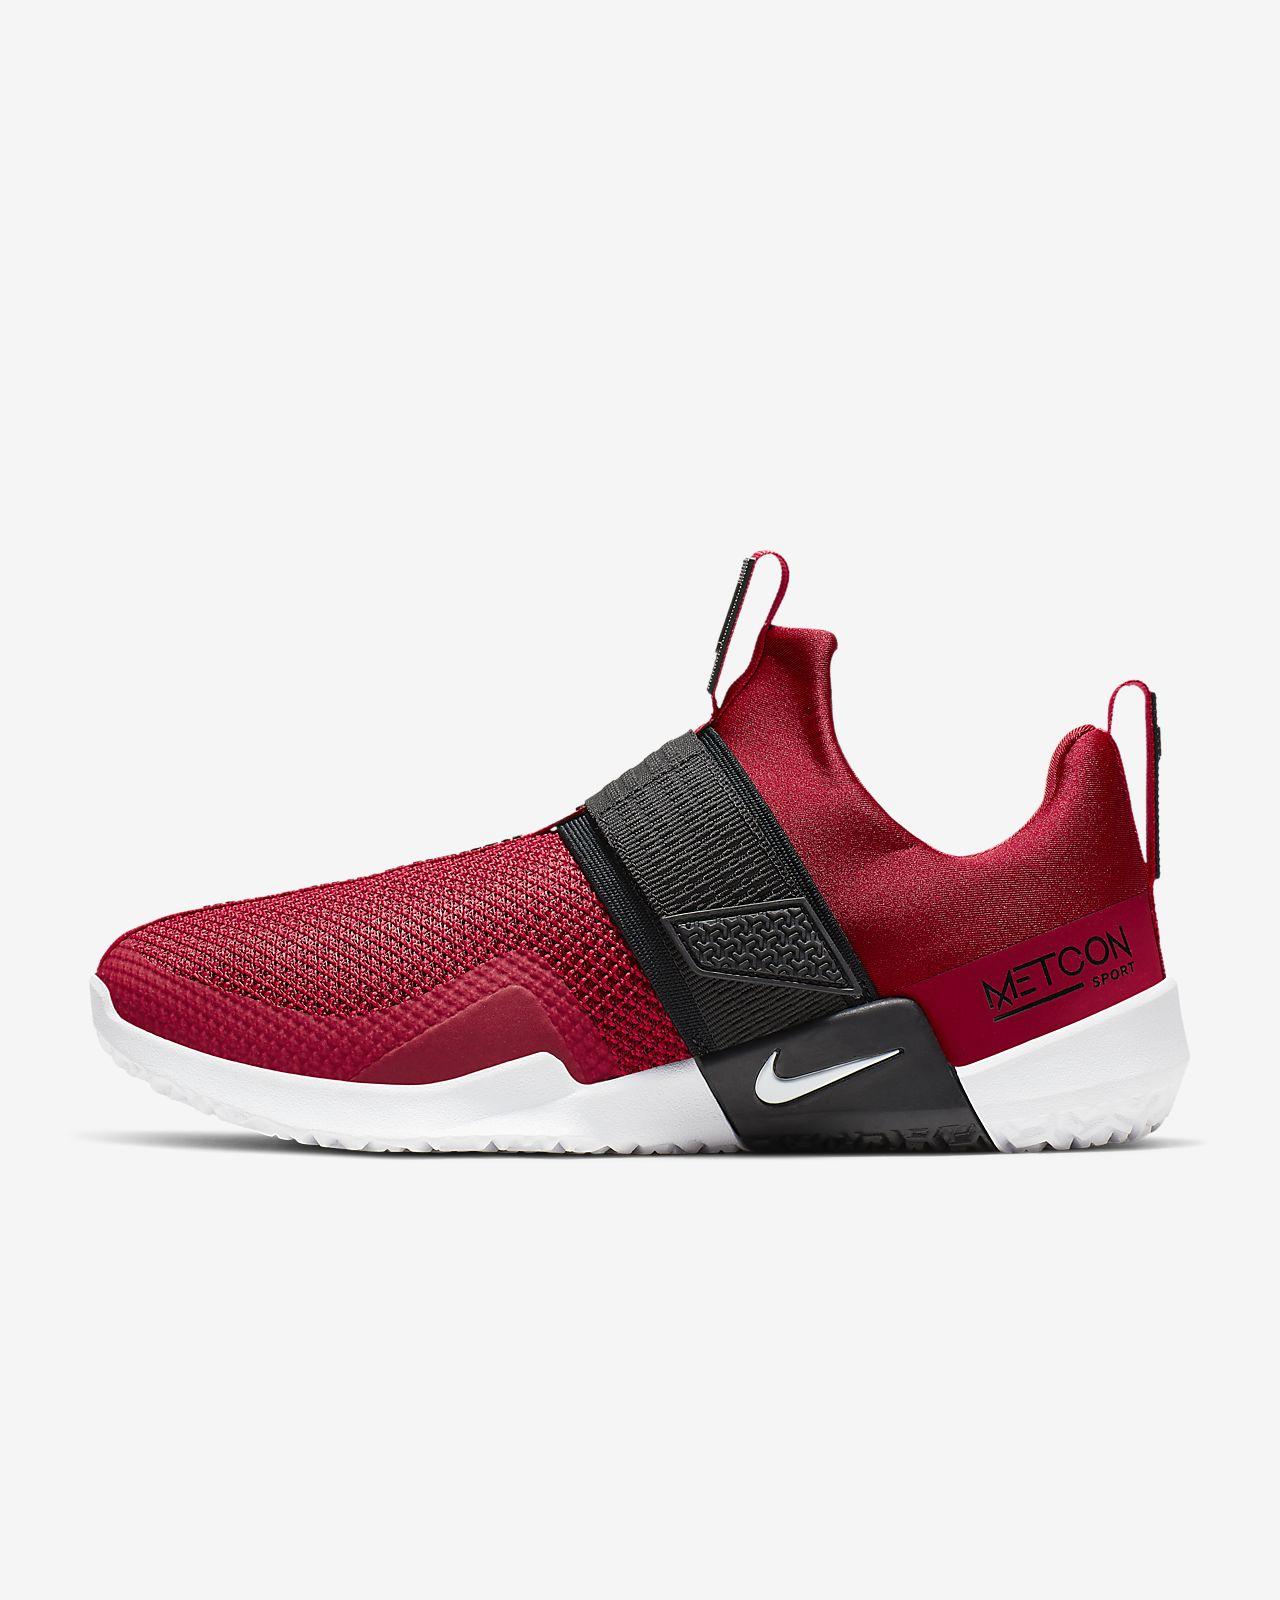 Nike Metcon Sport 男子训练鞋